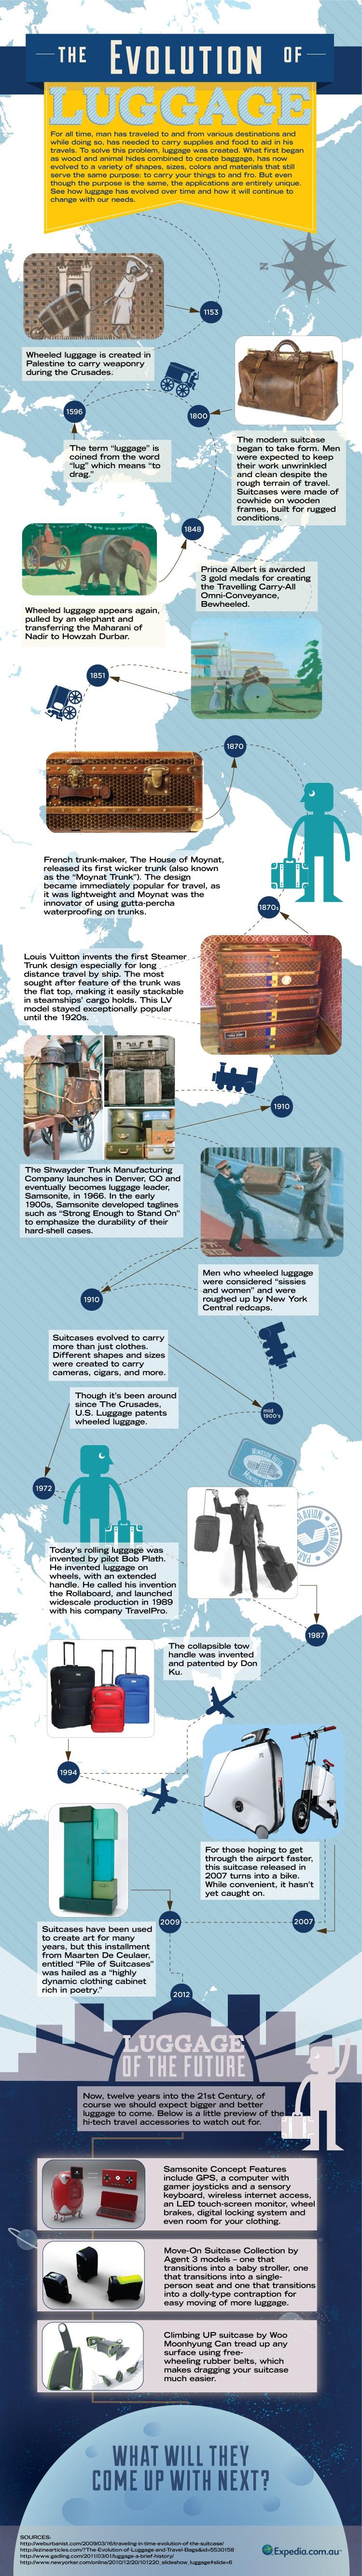 evolution of luggage